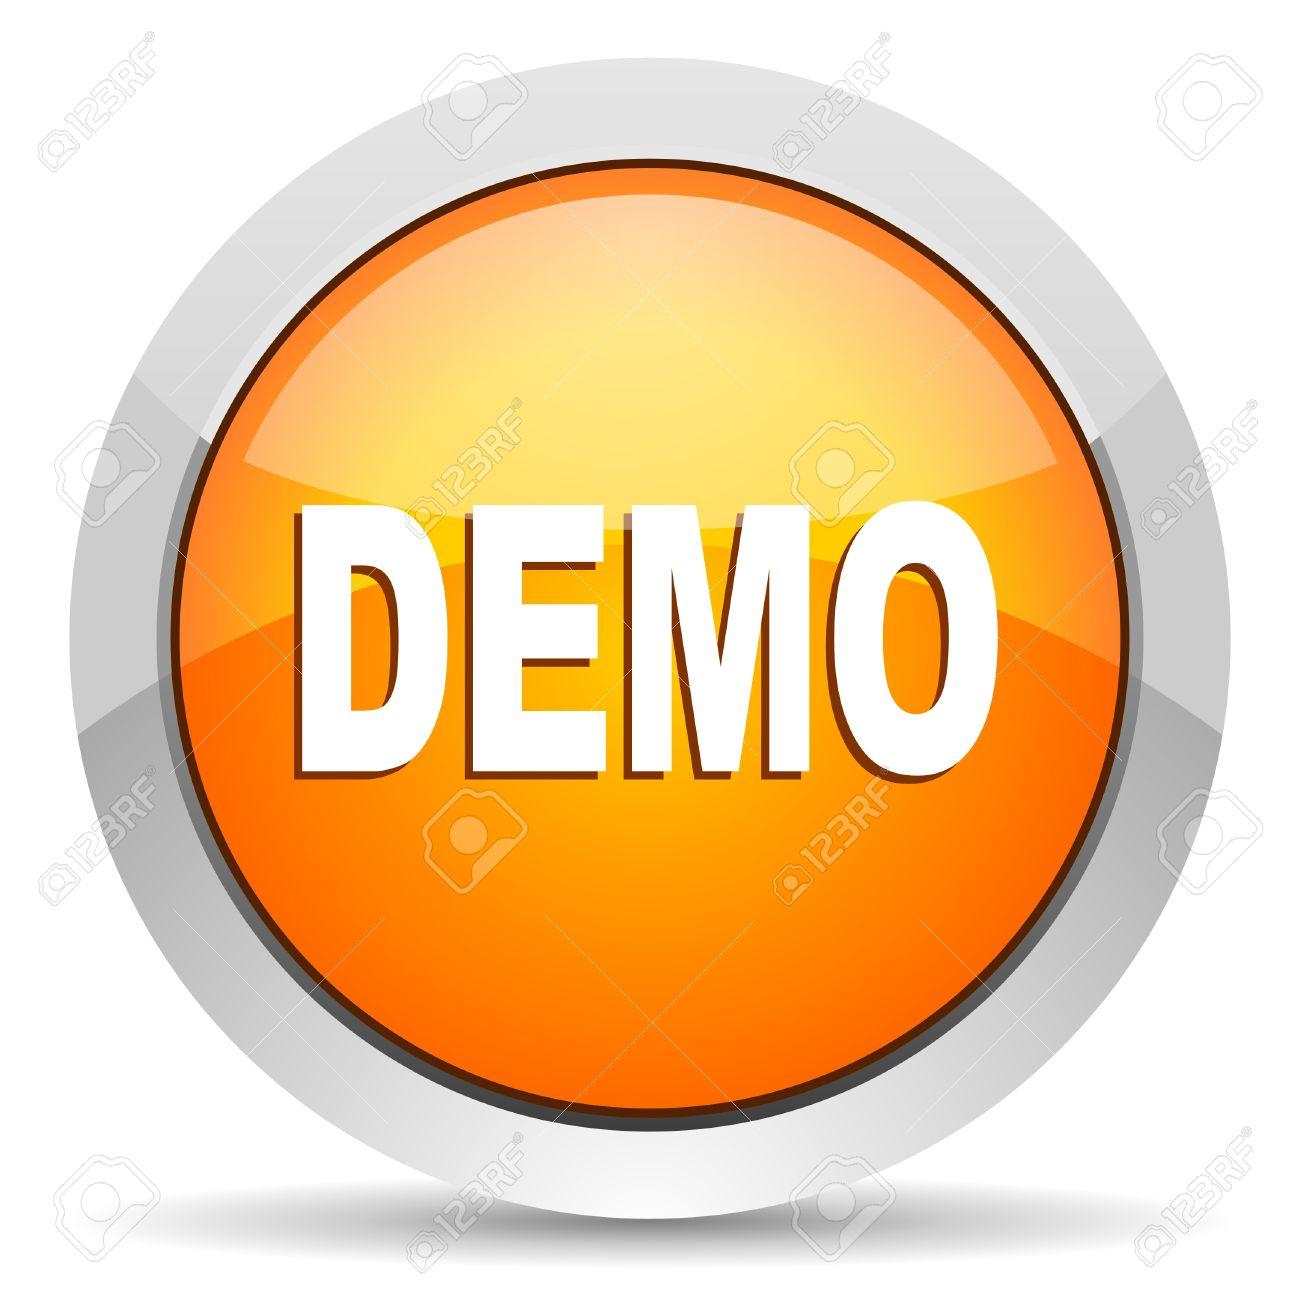 demo icon.